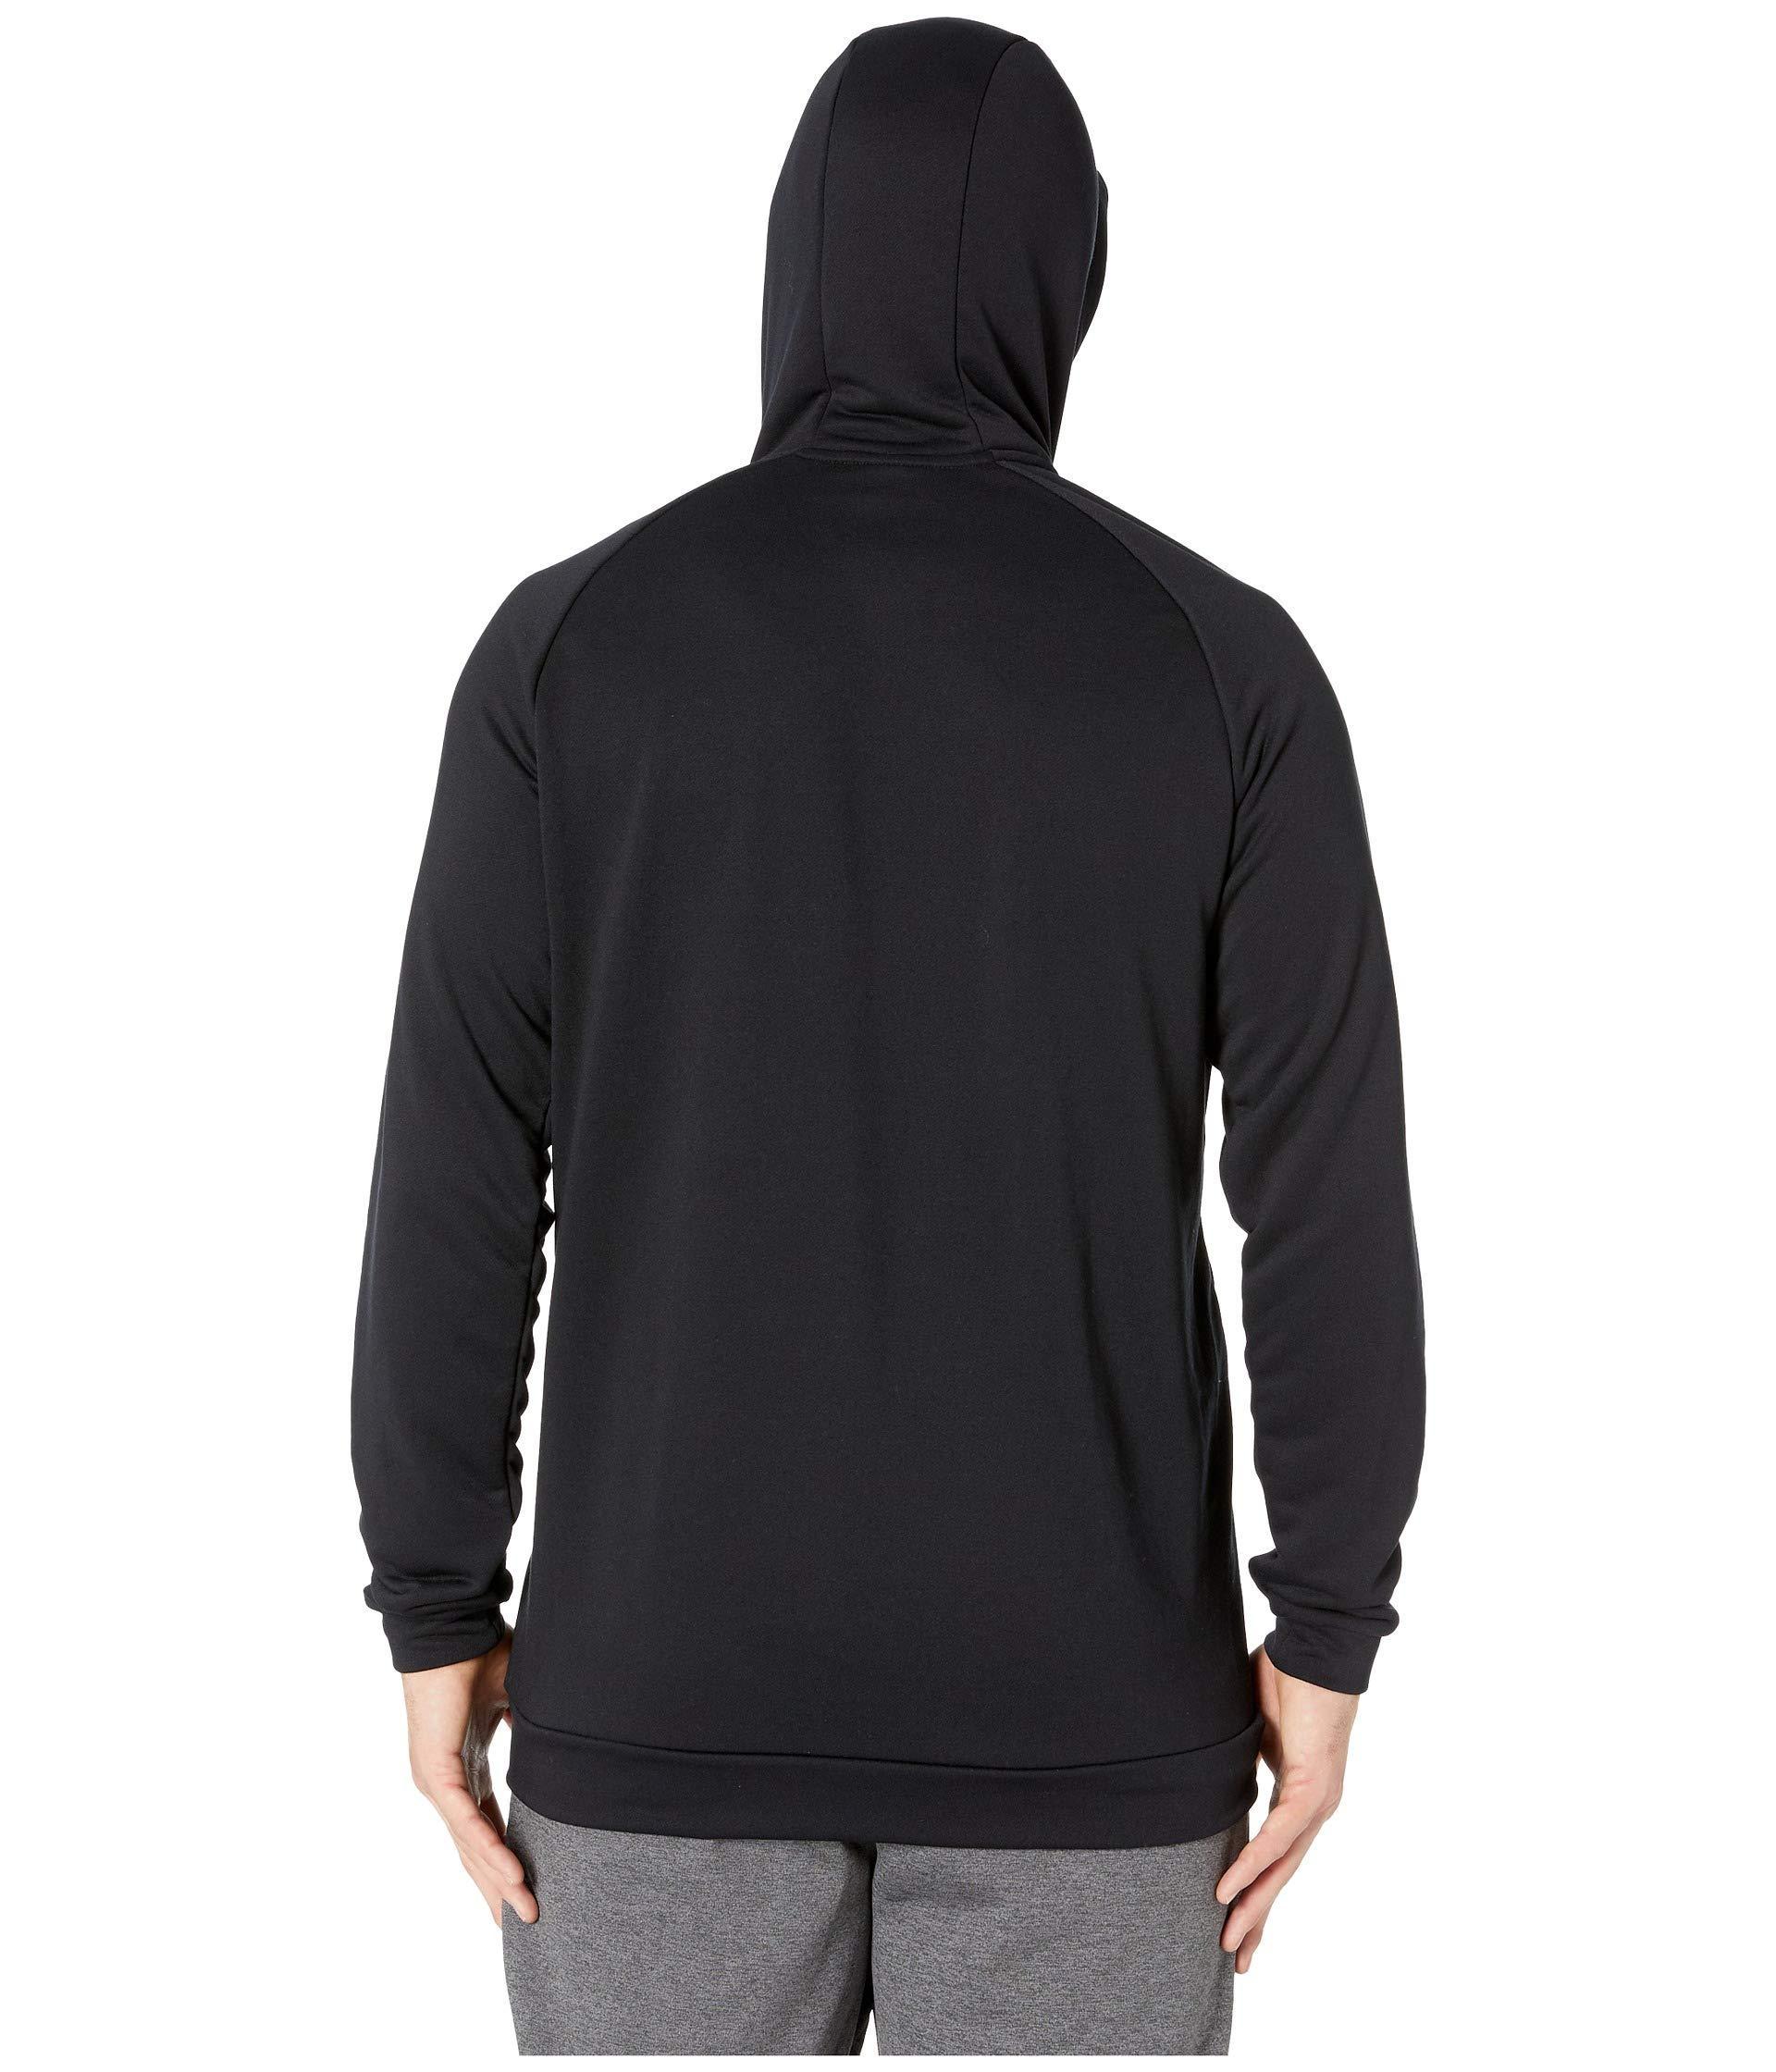 ad1f080192 Nike - Big Tall Dry Hoodie Pullover Fleece (black white) Men s Sweatshirt  for. View fullscreen